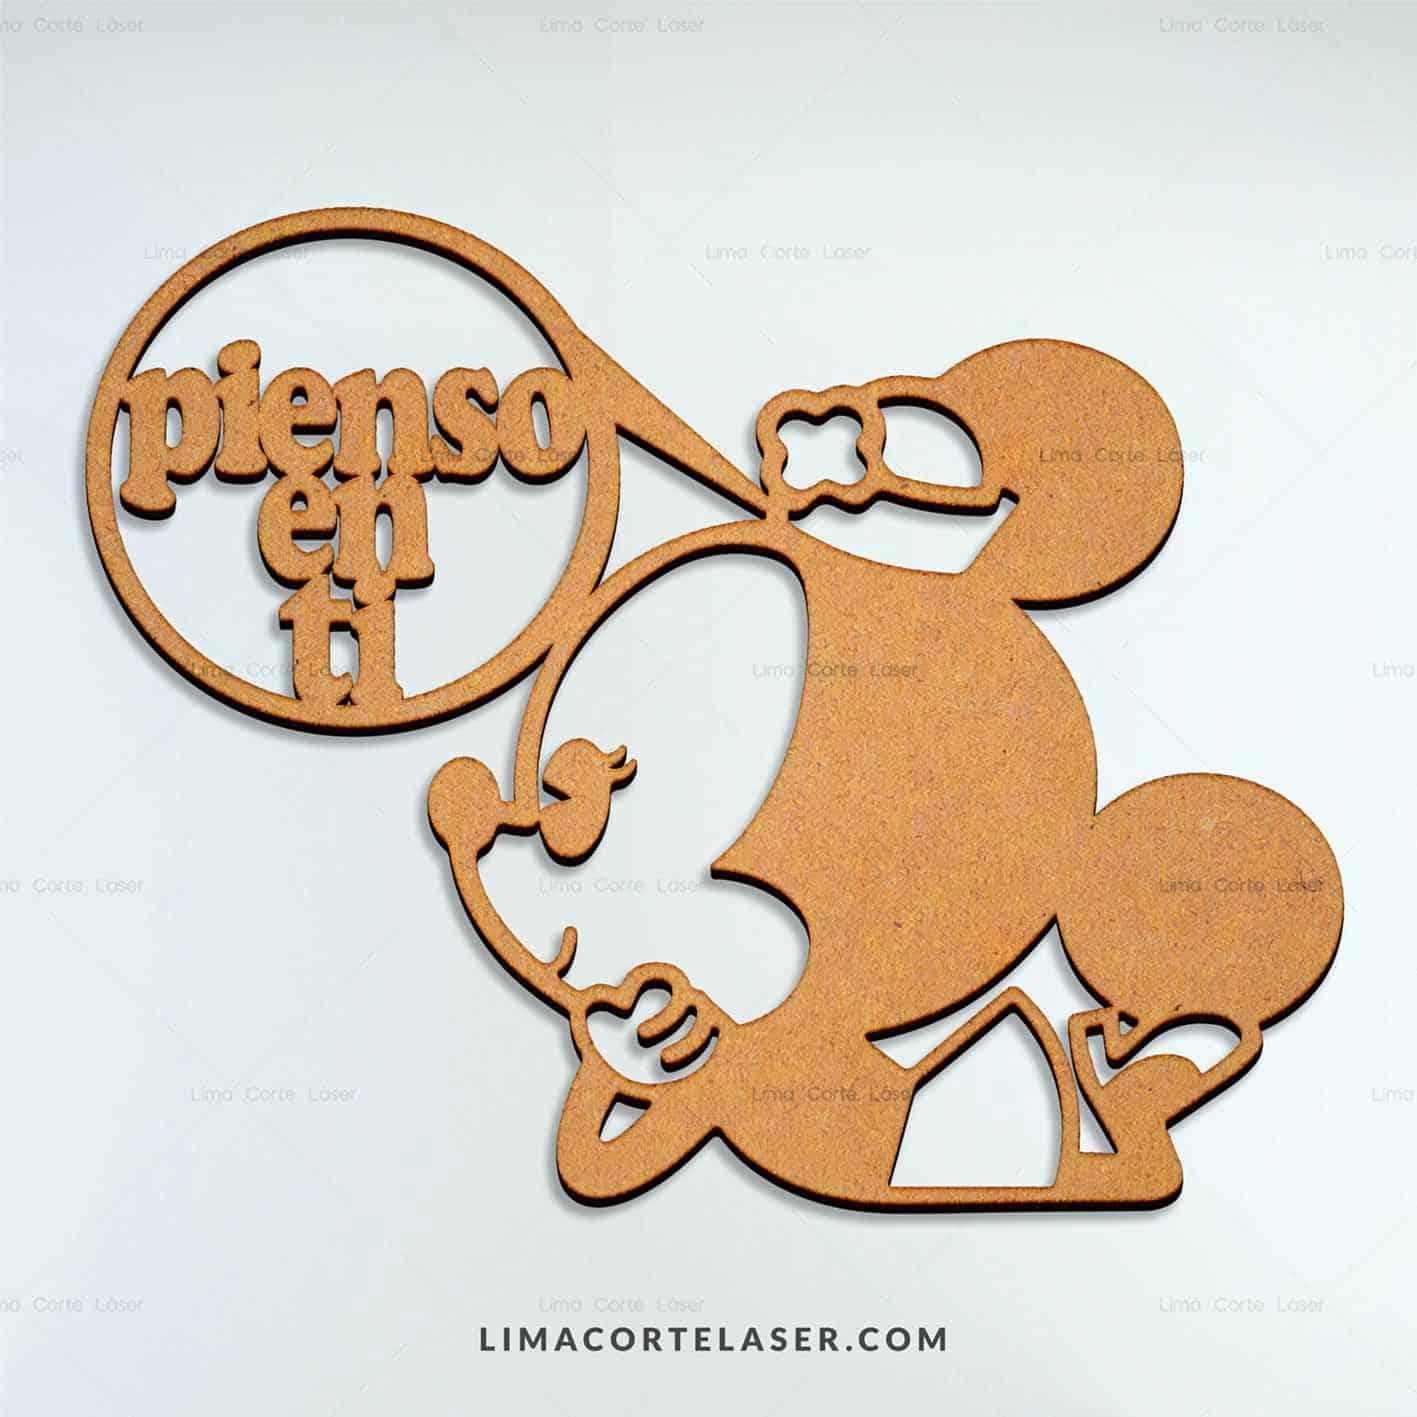 Corte láser MDF con la figura Minnie Mouse ideal para decorar una pared